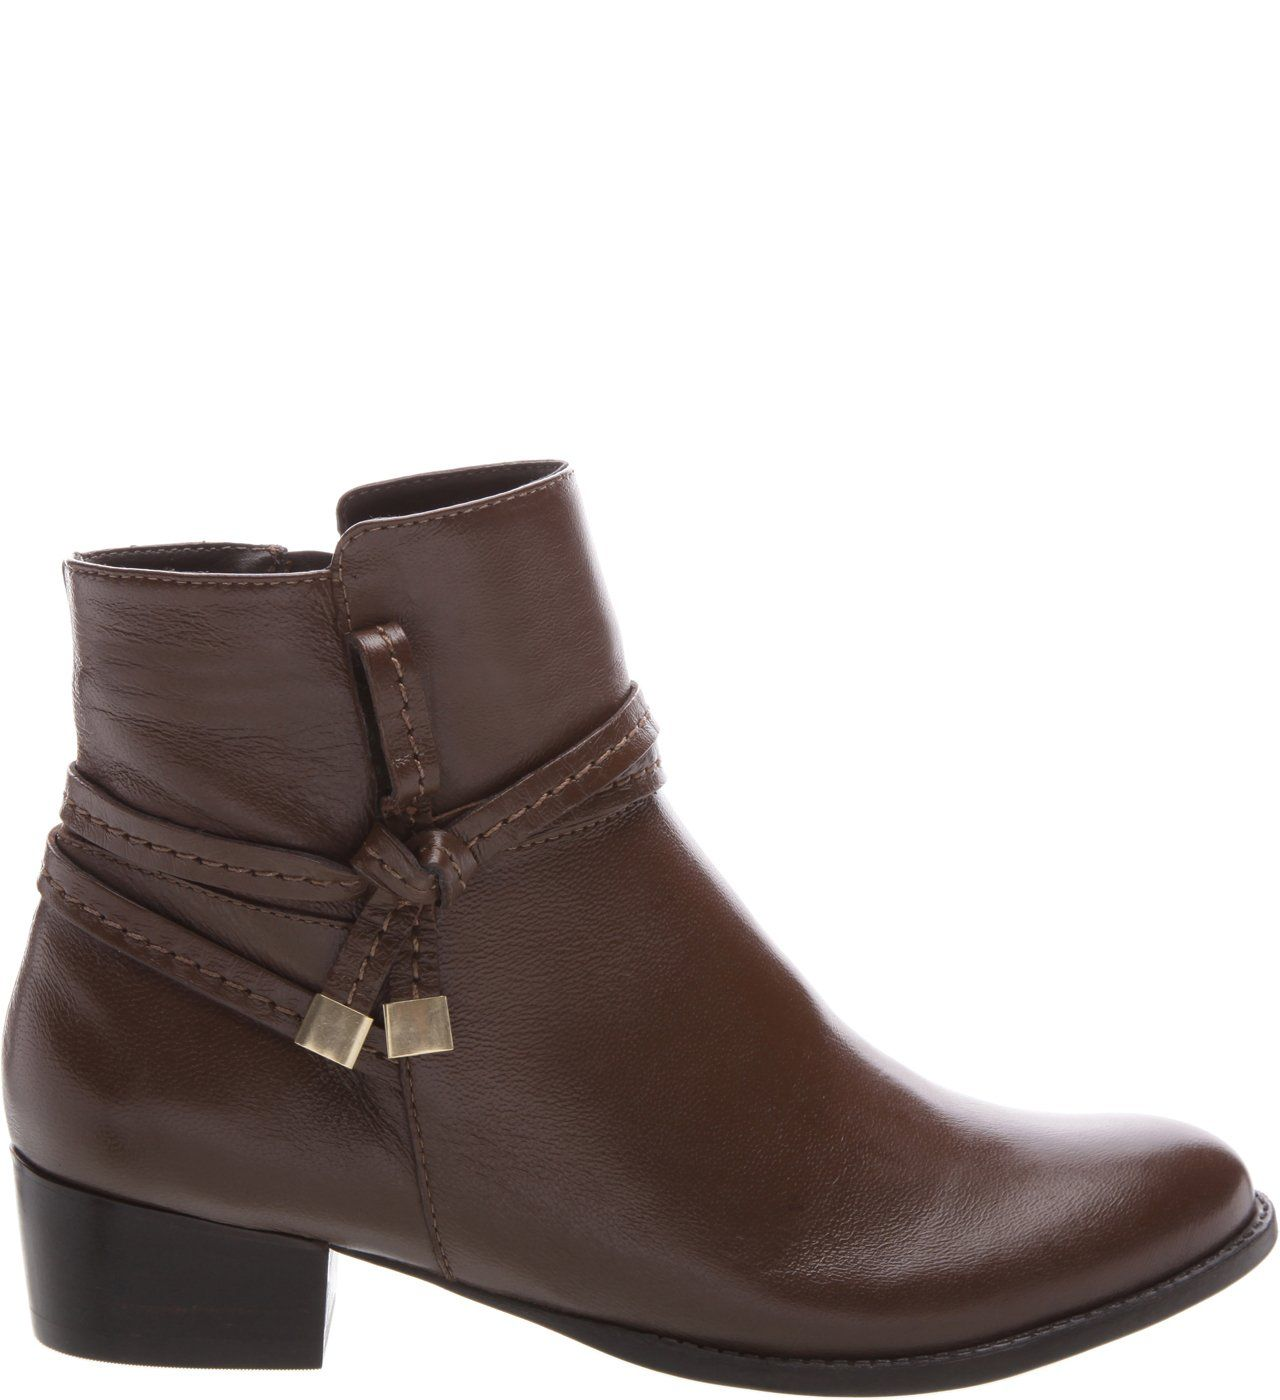 4aa2d2e9f Bota Couro Baixa Fenda Preta   Arezzo   arezzo em 2019   Boots, Shoes e  Ankle